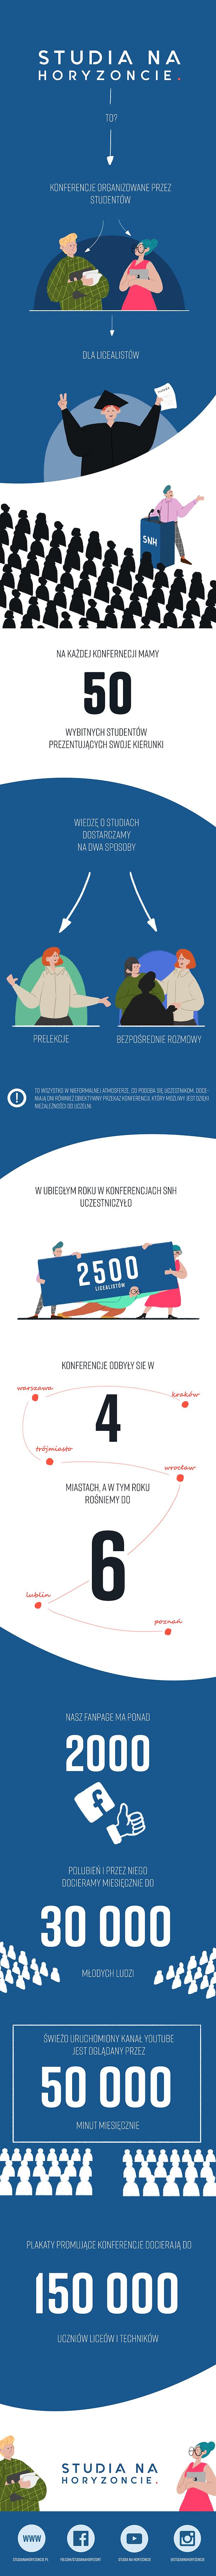 Infografika_SNH_Final.png